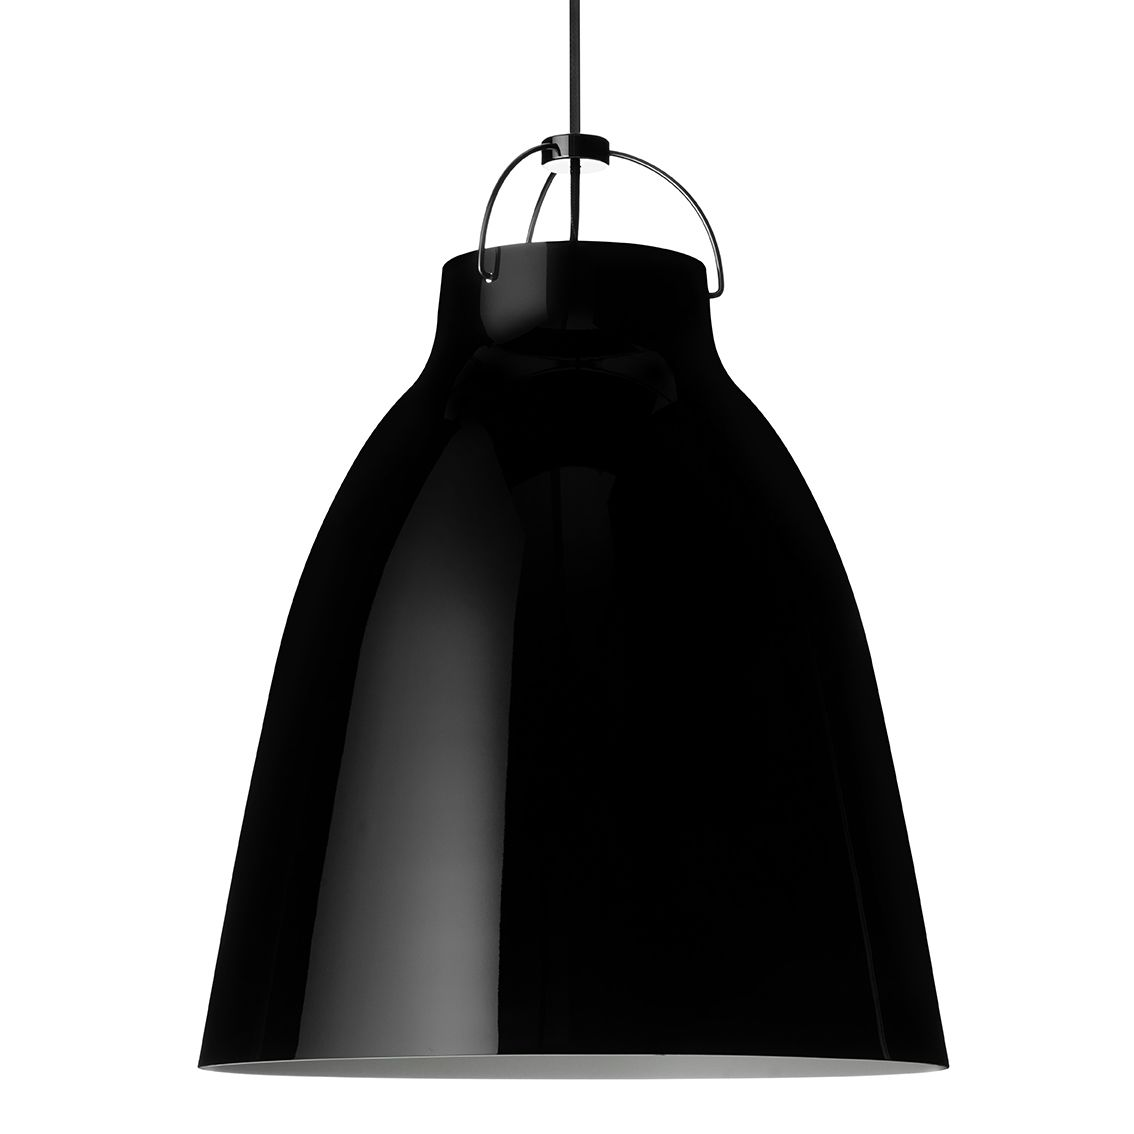 Caravaggio hanglamp Lightyears Ø55 hoogglans zwart